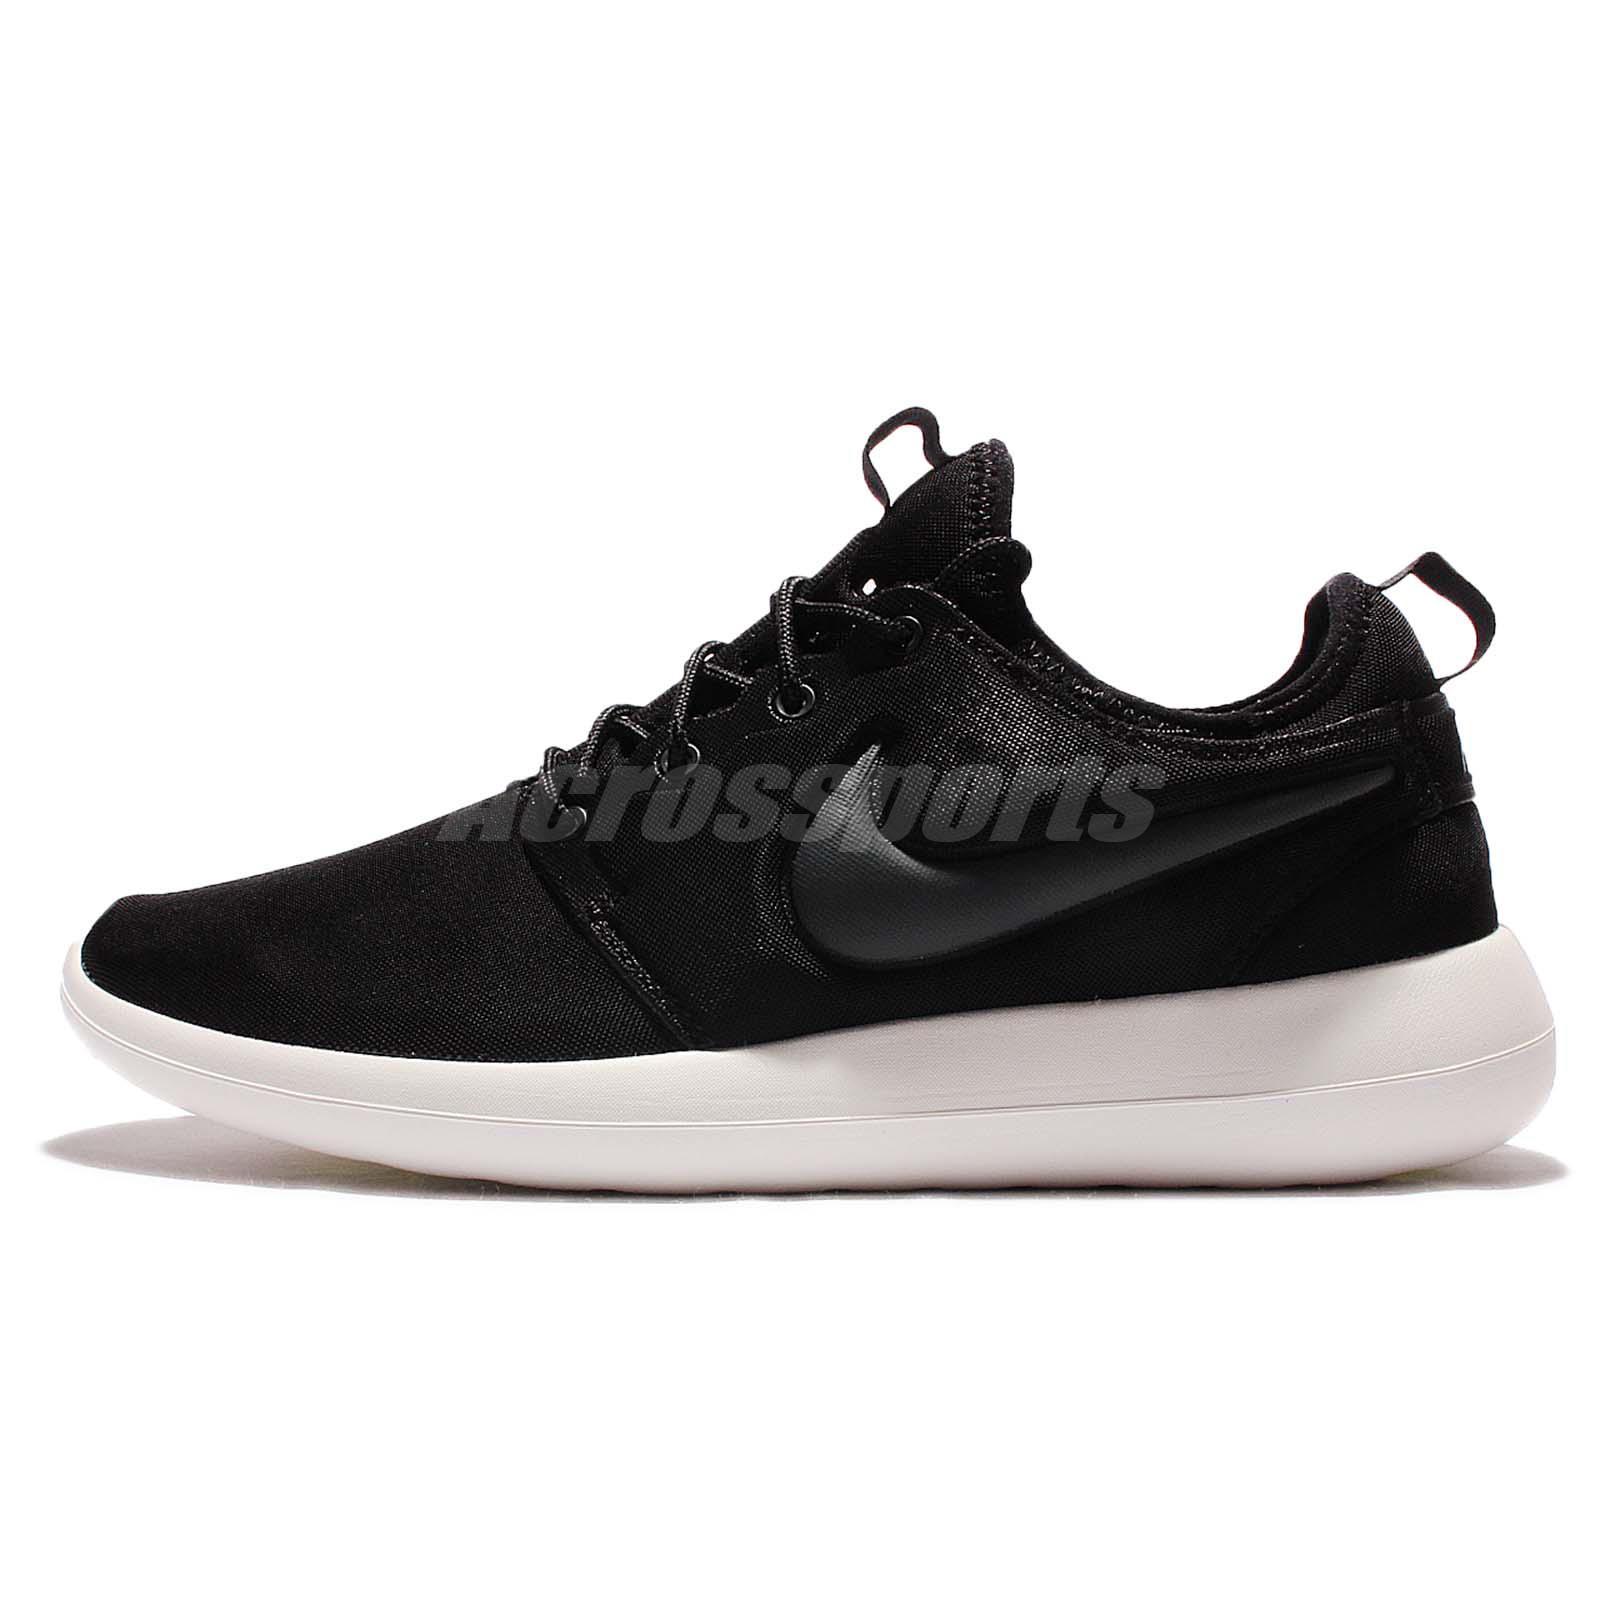 Wmns Nike Roshe Two 2 Rosherun Black Sail Women Running Shoe Sneakers  844931-002